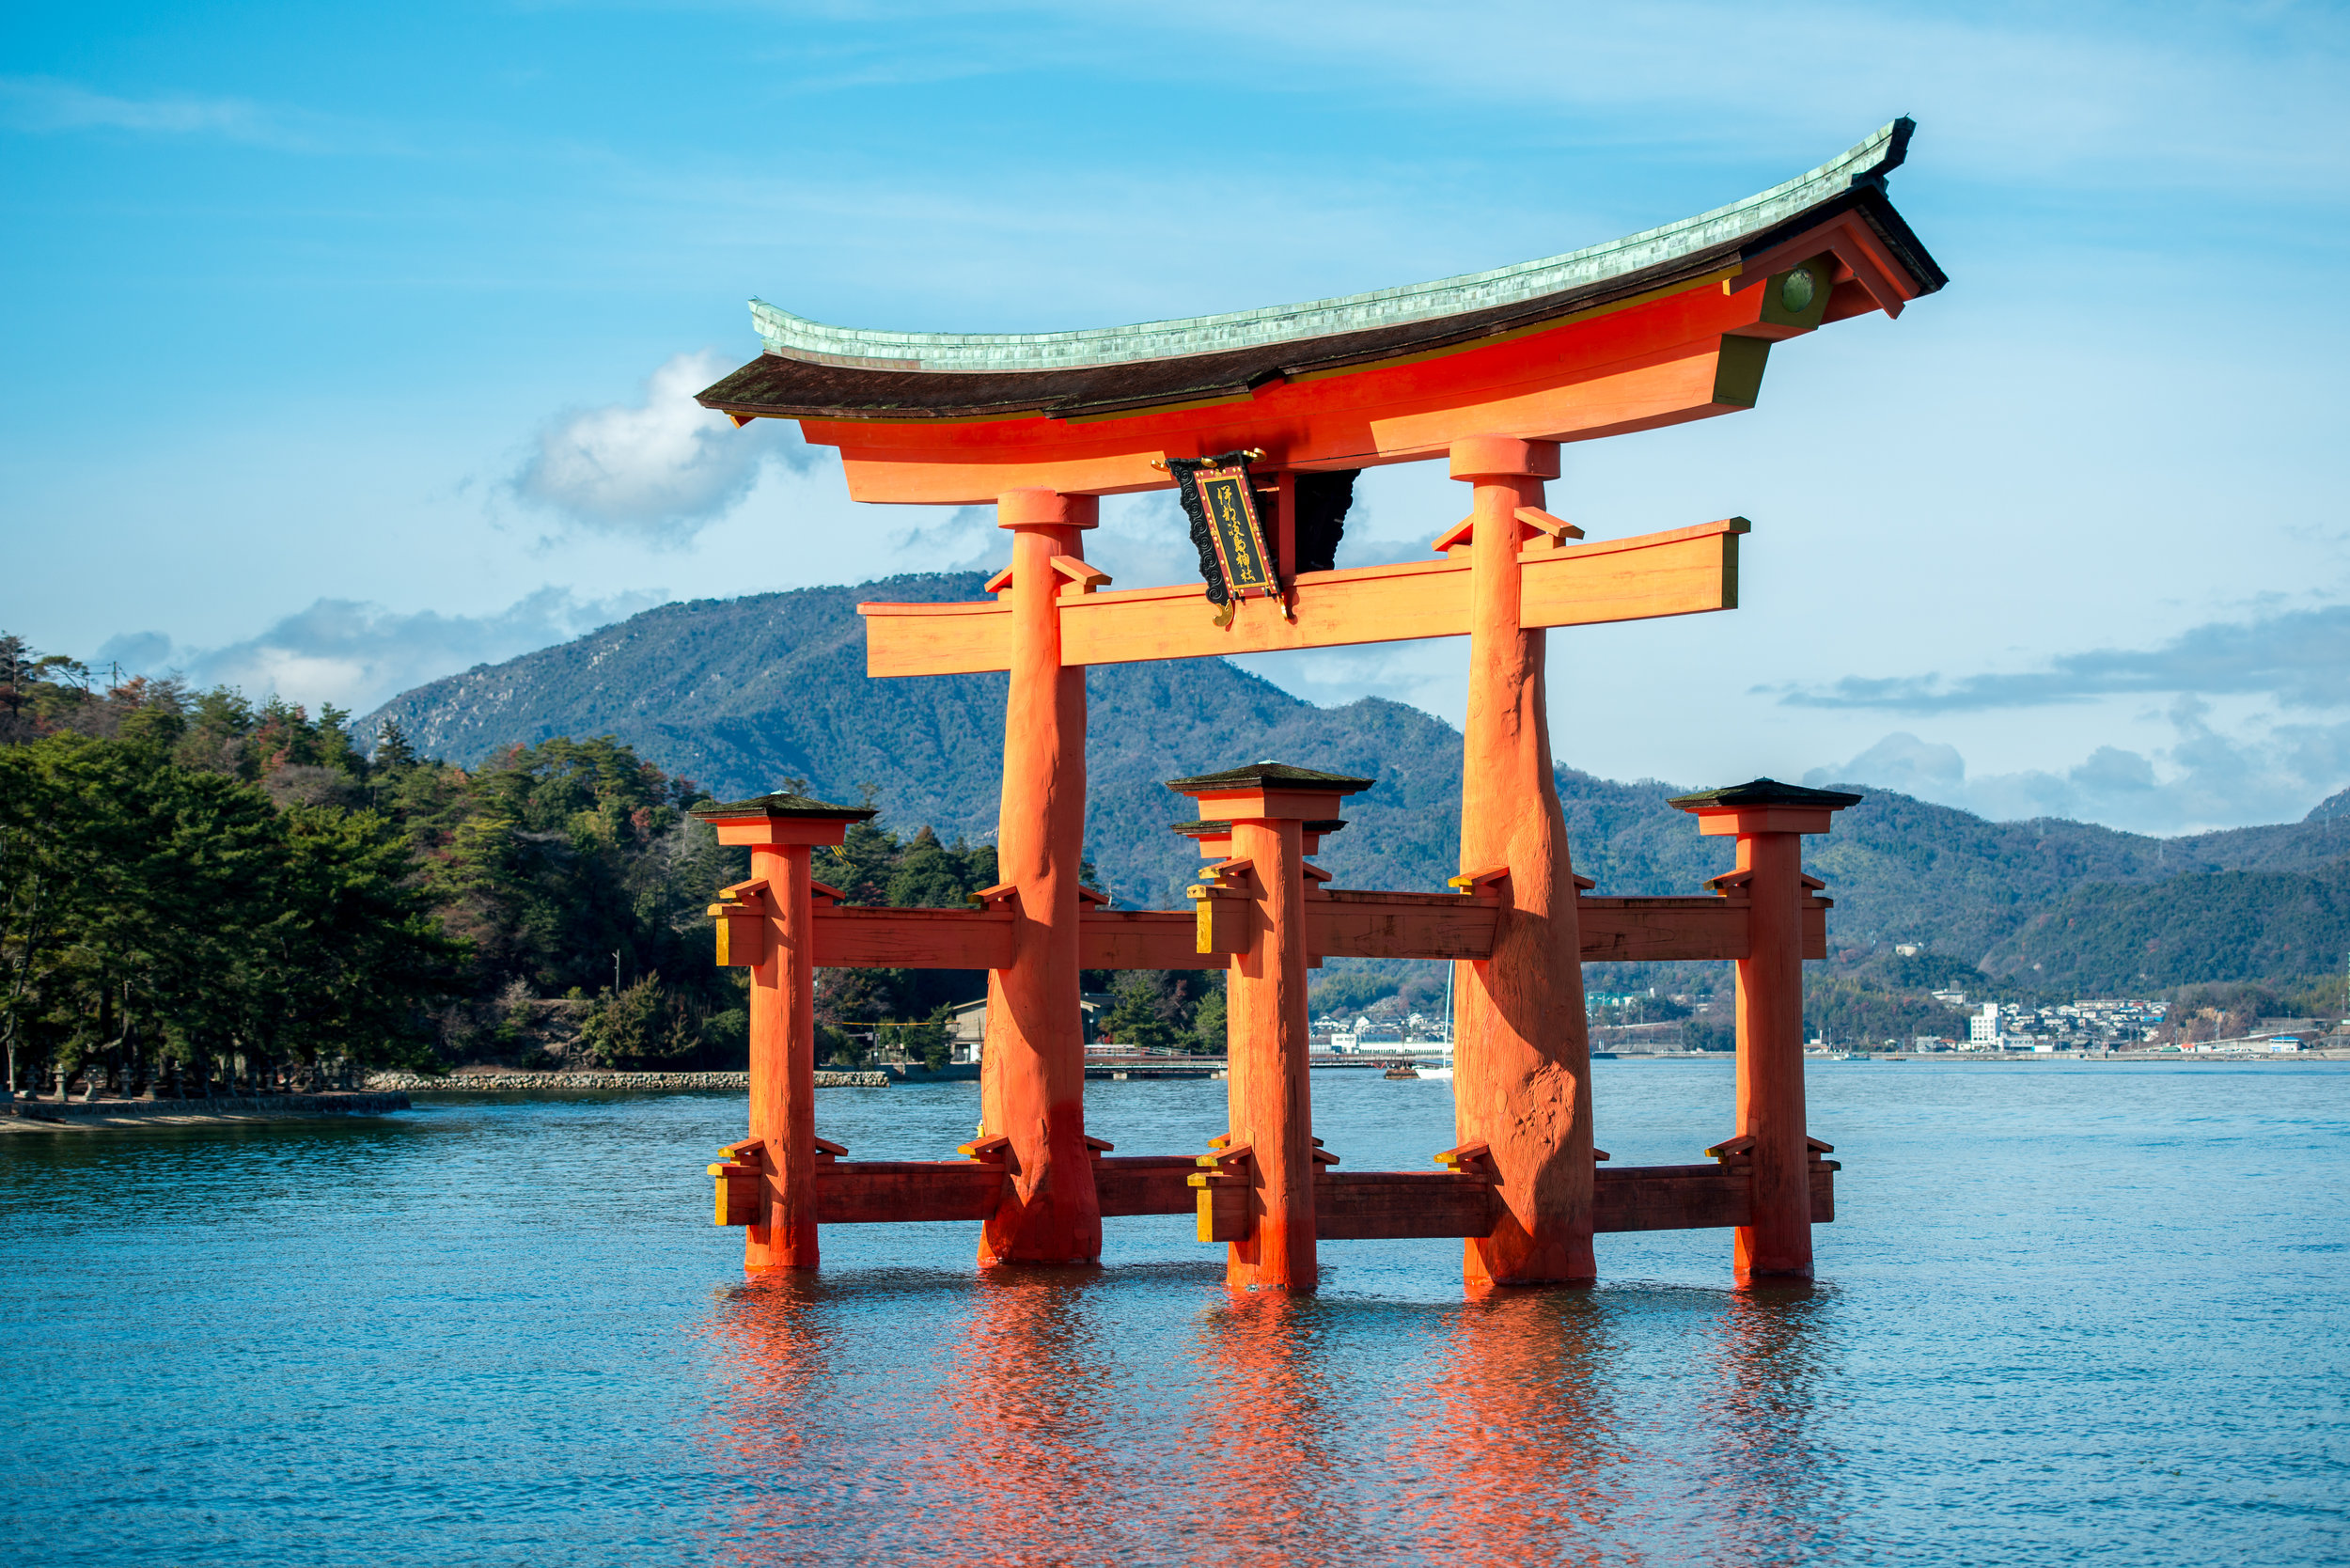 Itsukushima Gate, image from Wikimedia Commons © Jeordy Meow